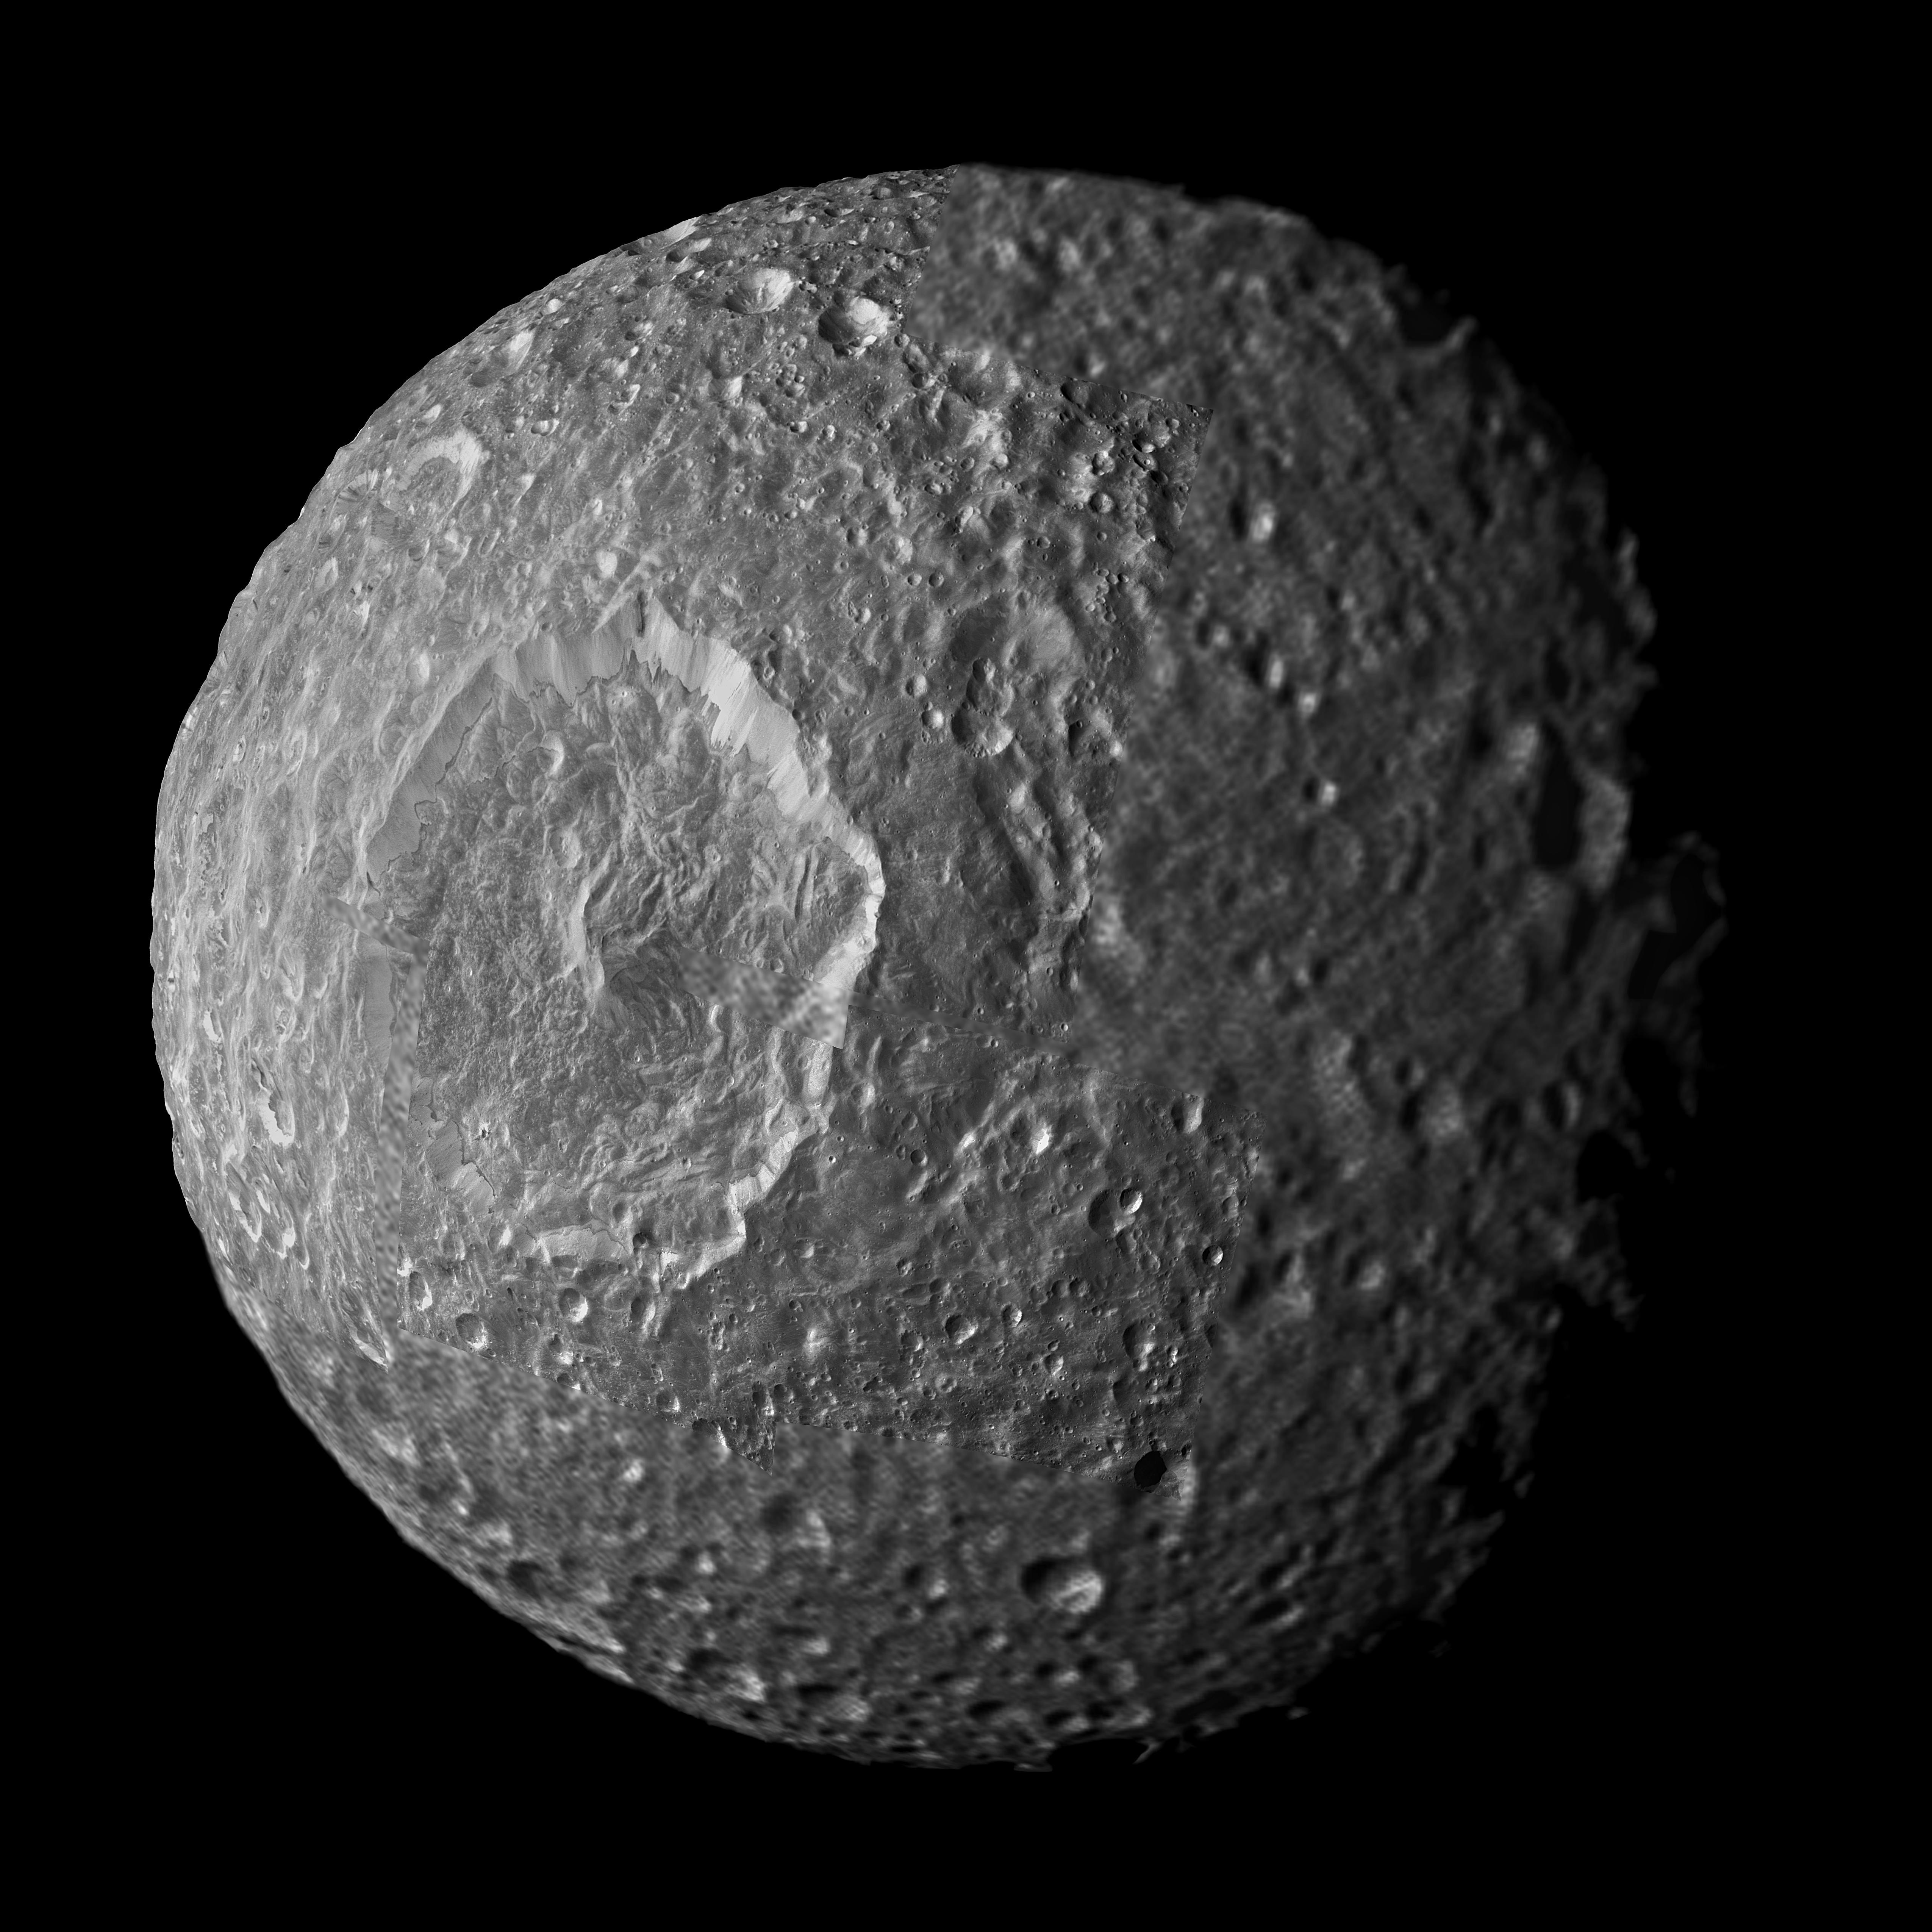 Streaks and Markings on Saturn's Moon Mimas